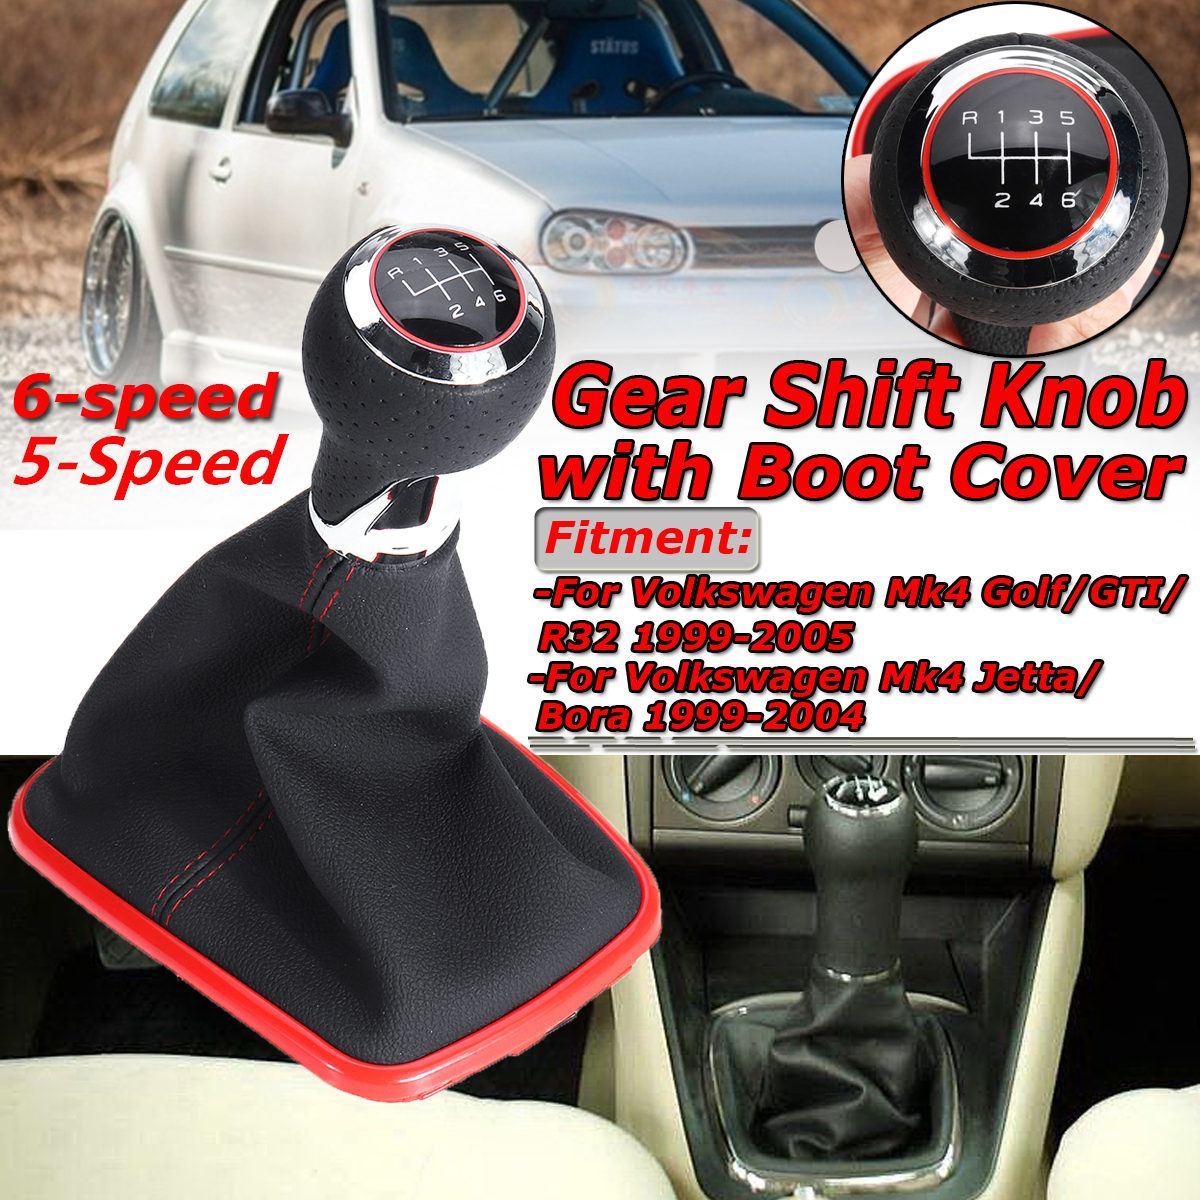 2019 Fashion New Car Gear Shift Knob With Boot Cover 5-speed/ 6-speed For Volkswagen Jetta Mk4 Golf/gti/r32 1999-2005 Jetta/bora 1999-2004